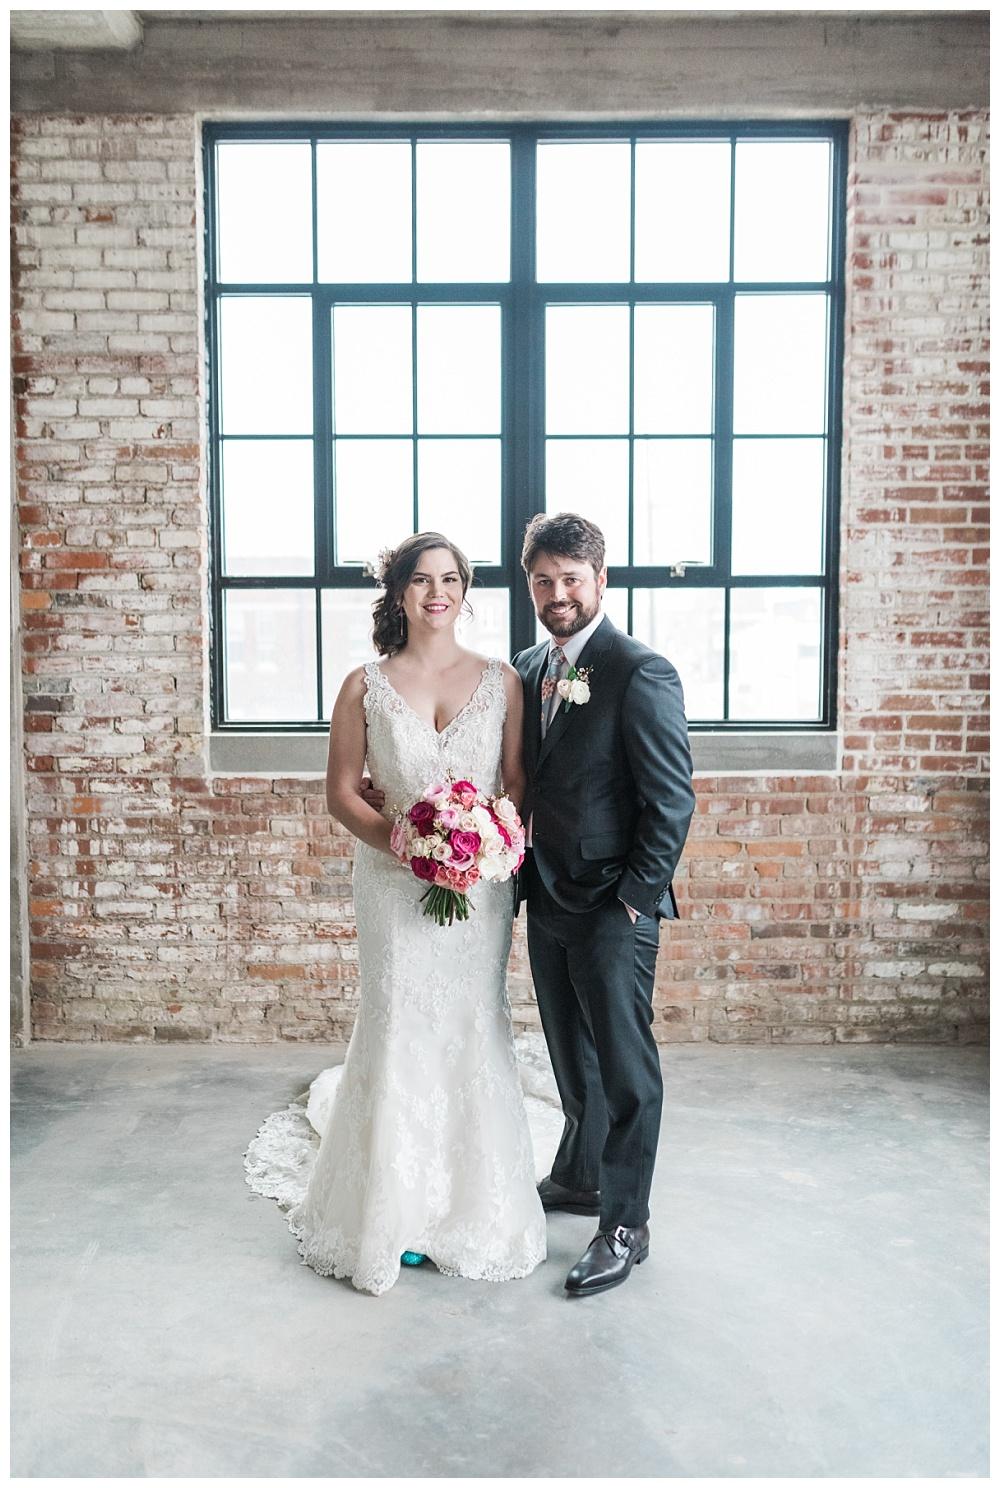 Stephanie Marie Photography Millwork District Ballroom Dubuque Iowa Wedding Photographer Tanesha Jake Thomsen_0024.jpg